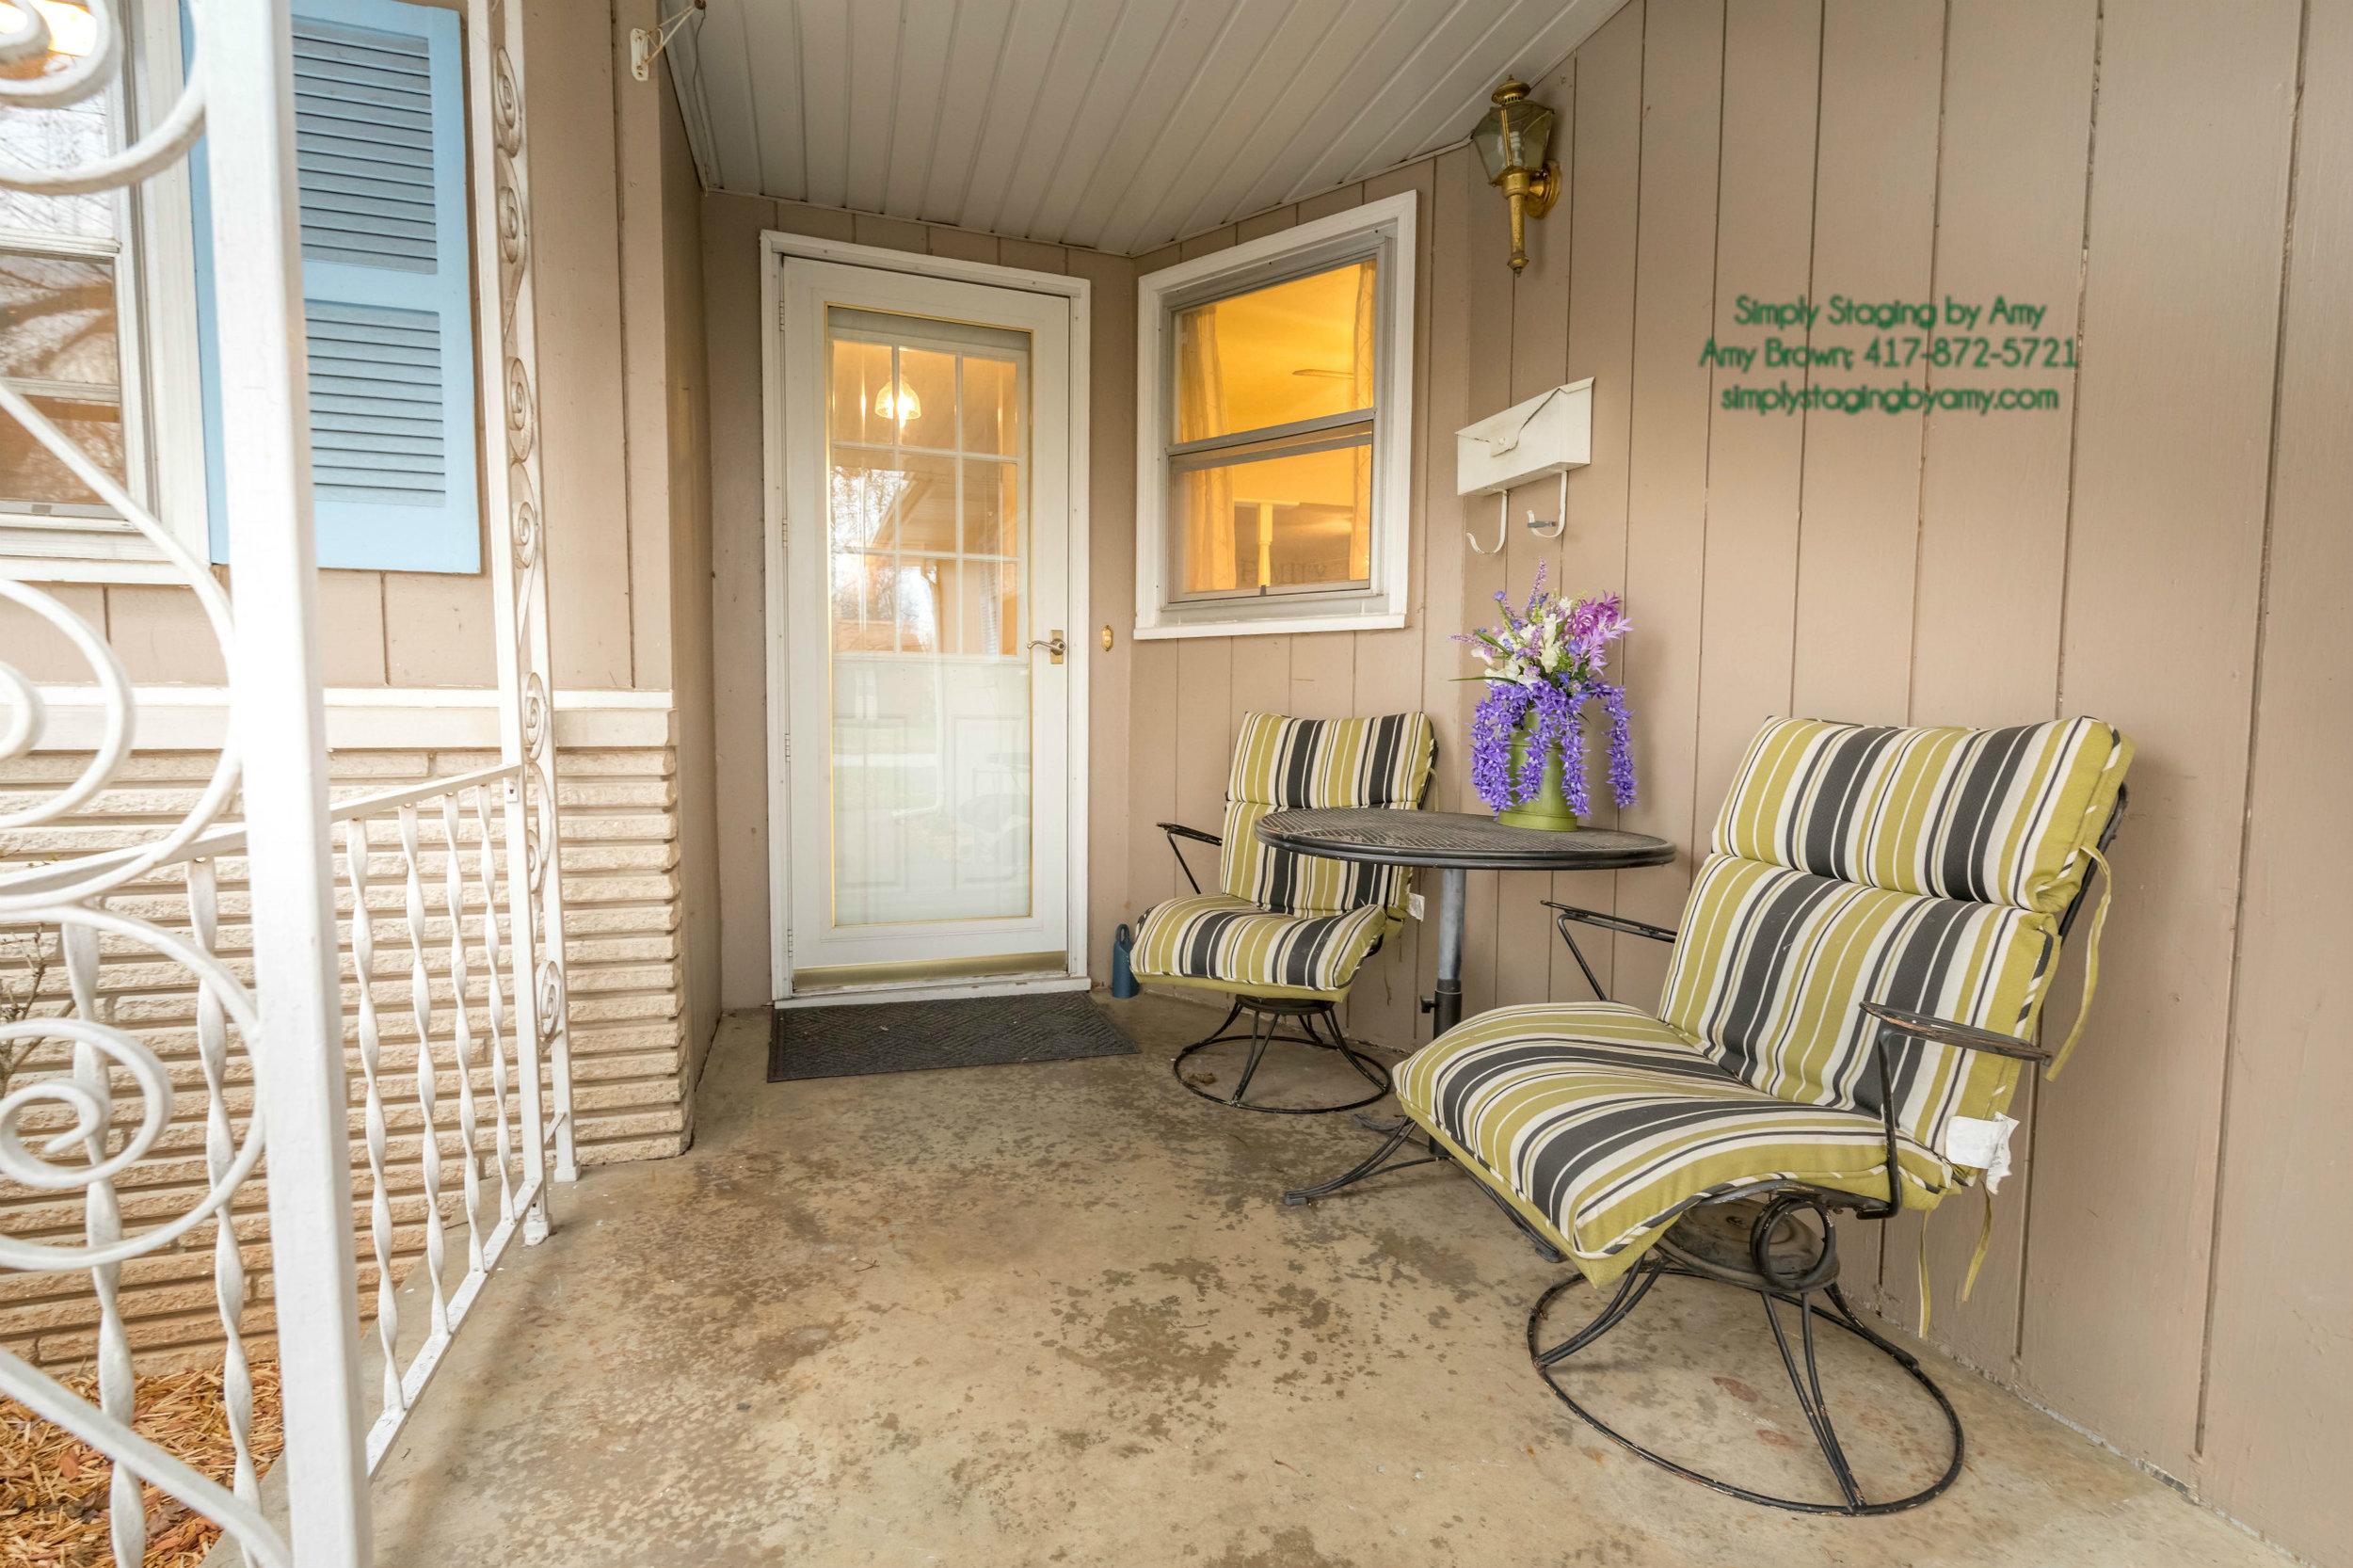 (35) 1435 E Crestview Spfd Front Porch After.jpg